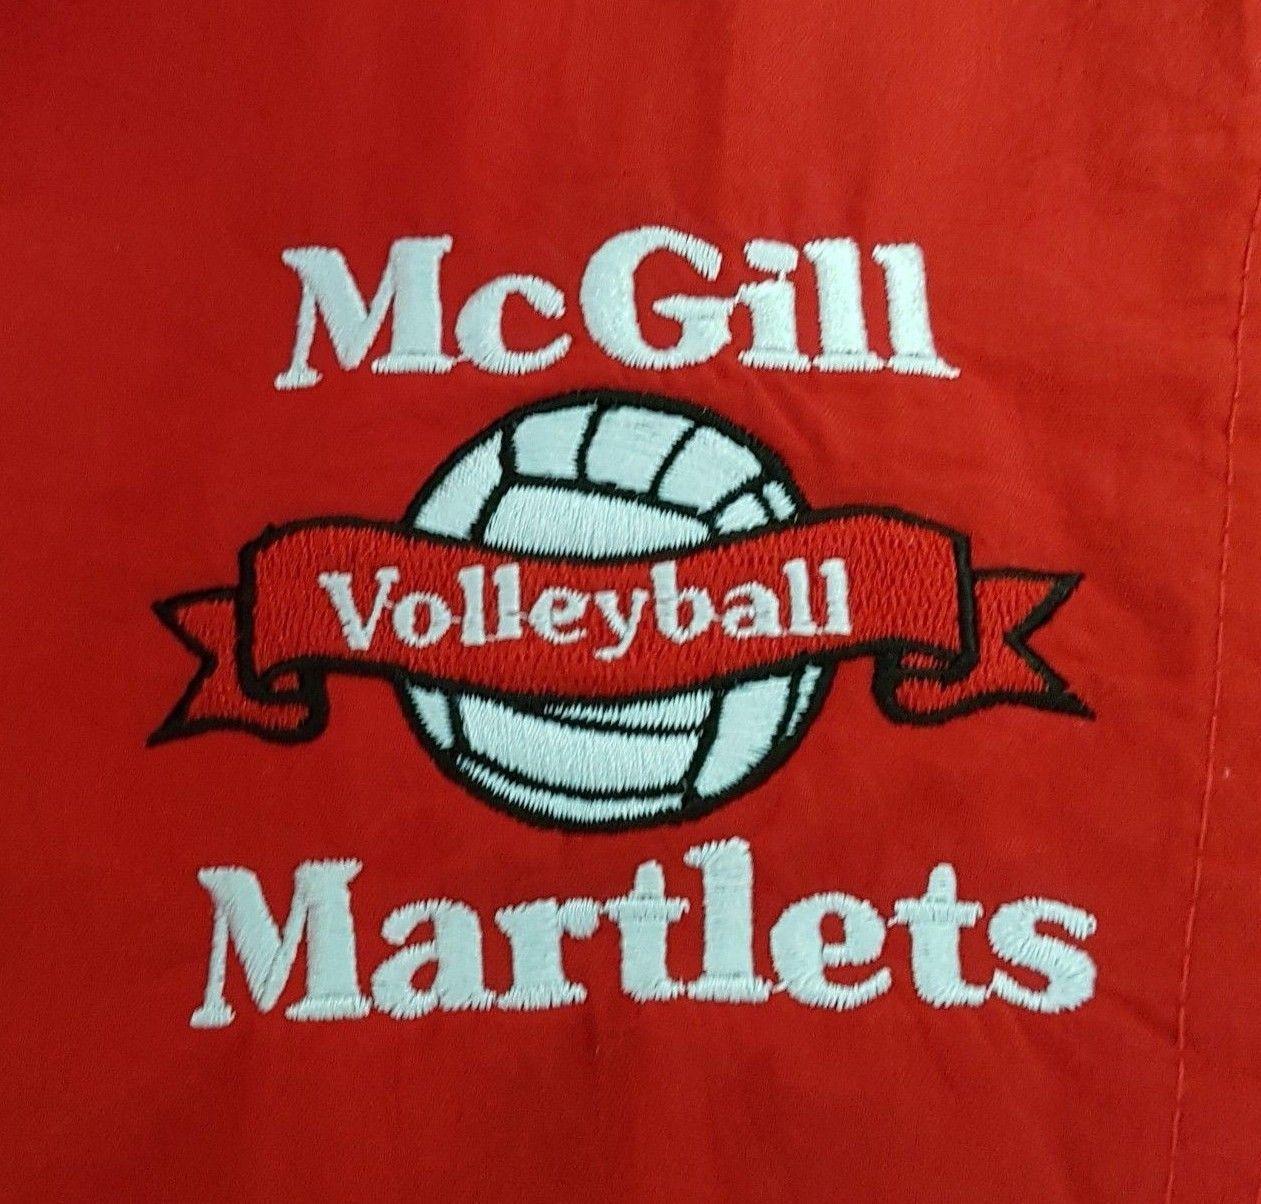 2b8241c18f264 Vintage McGill University Volleyball Lined Windbreaker Jacket ASICS Size  Large